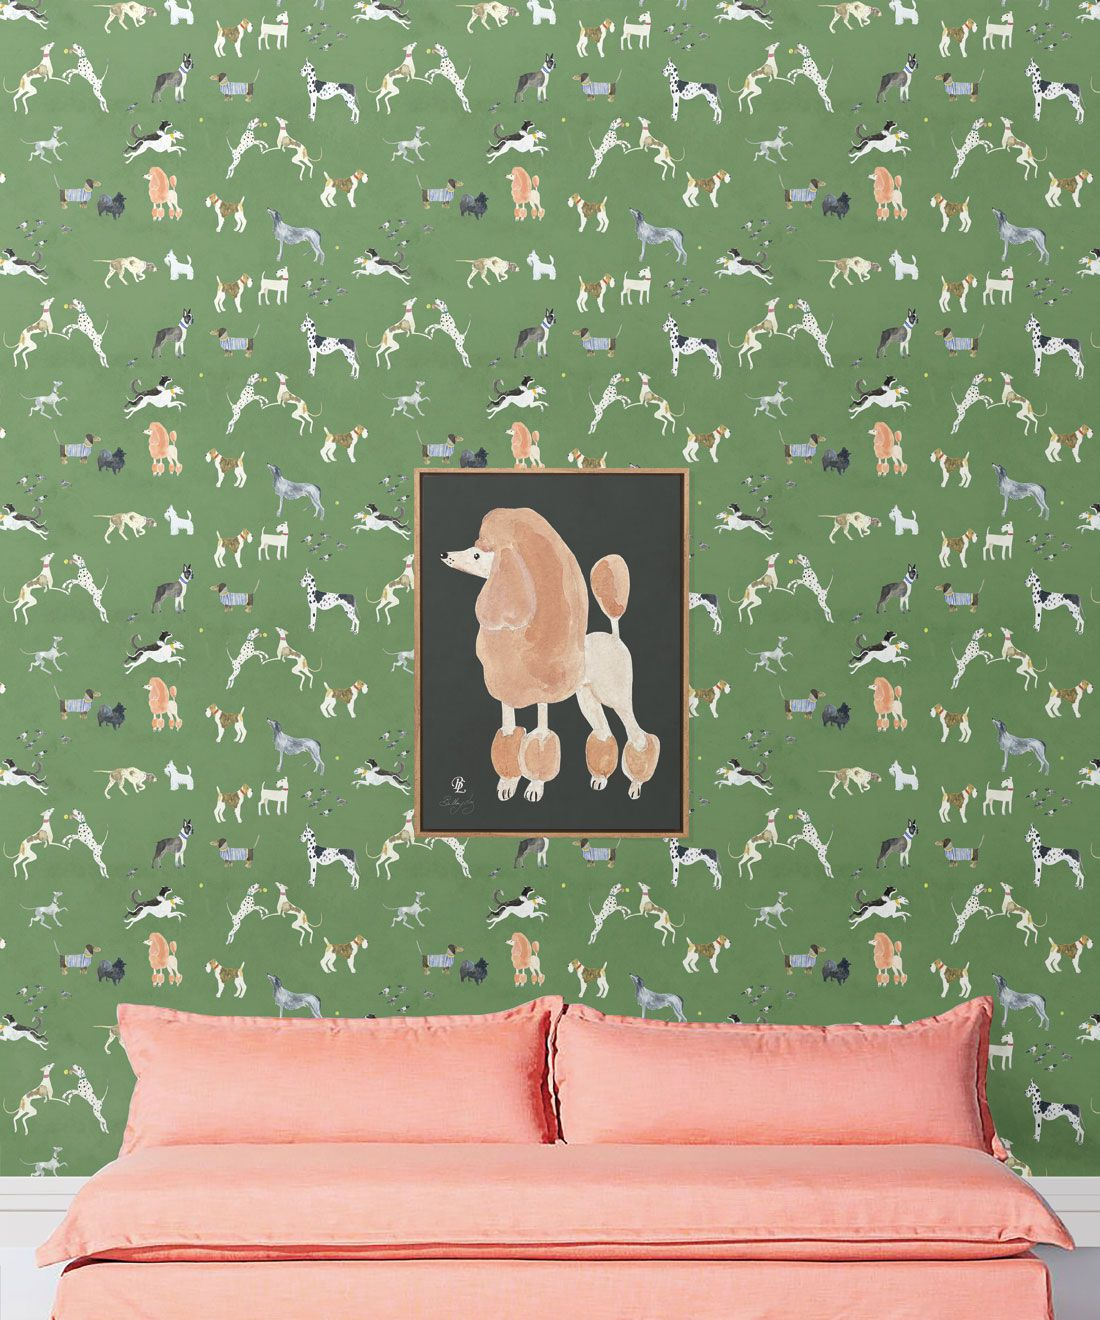 Doggies Wallpaper •Dog Wallpaper •Green • Insitu with salmon colored sofa